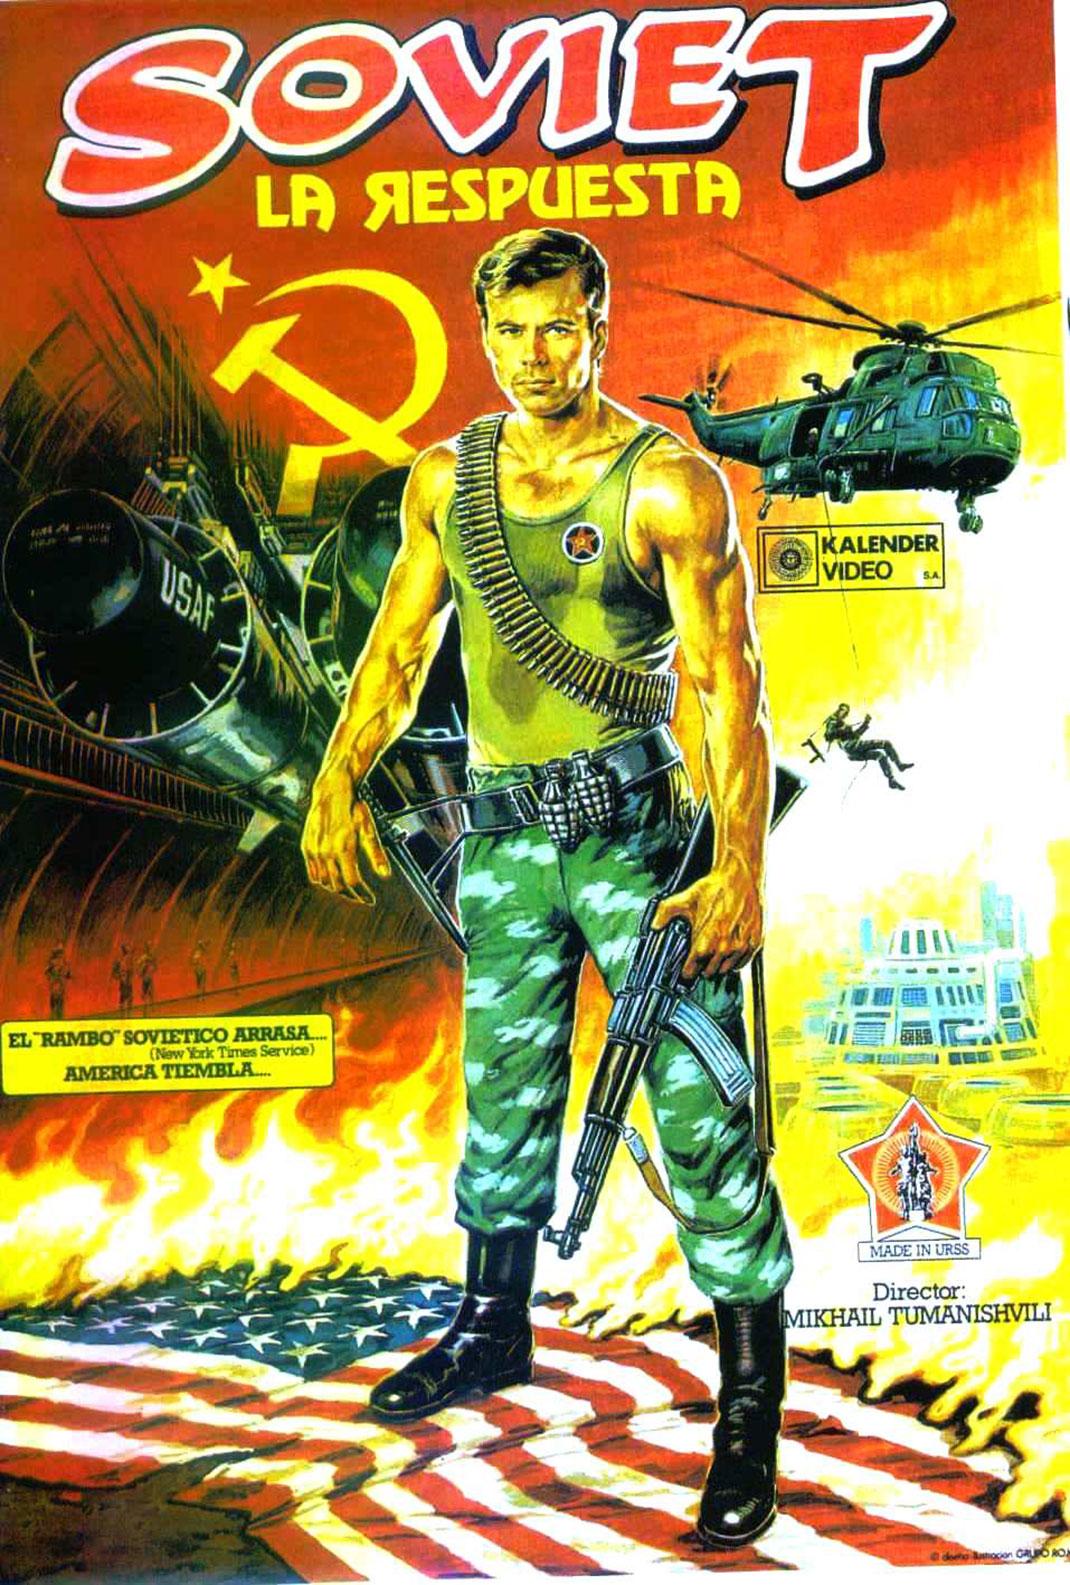 Le-soviet-esp